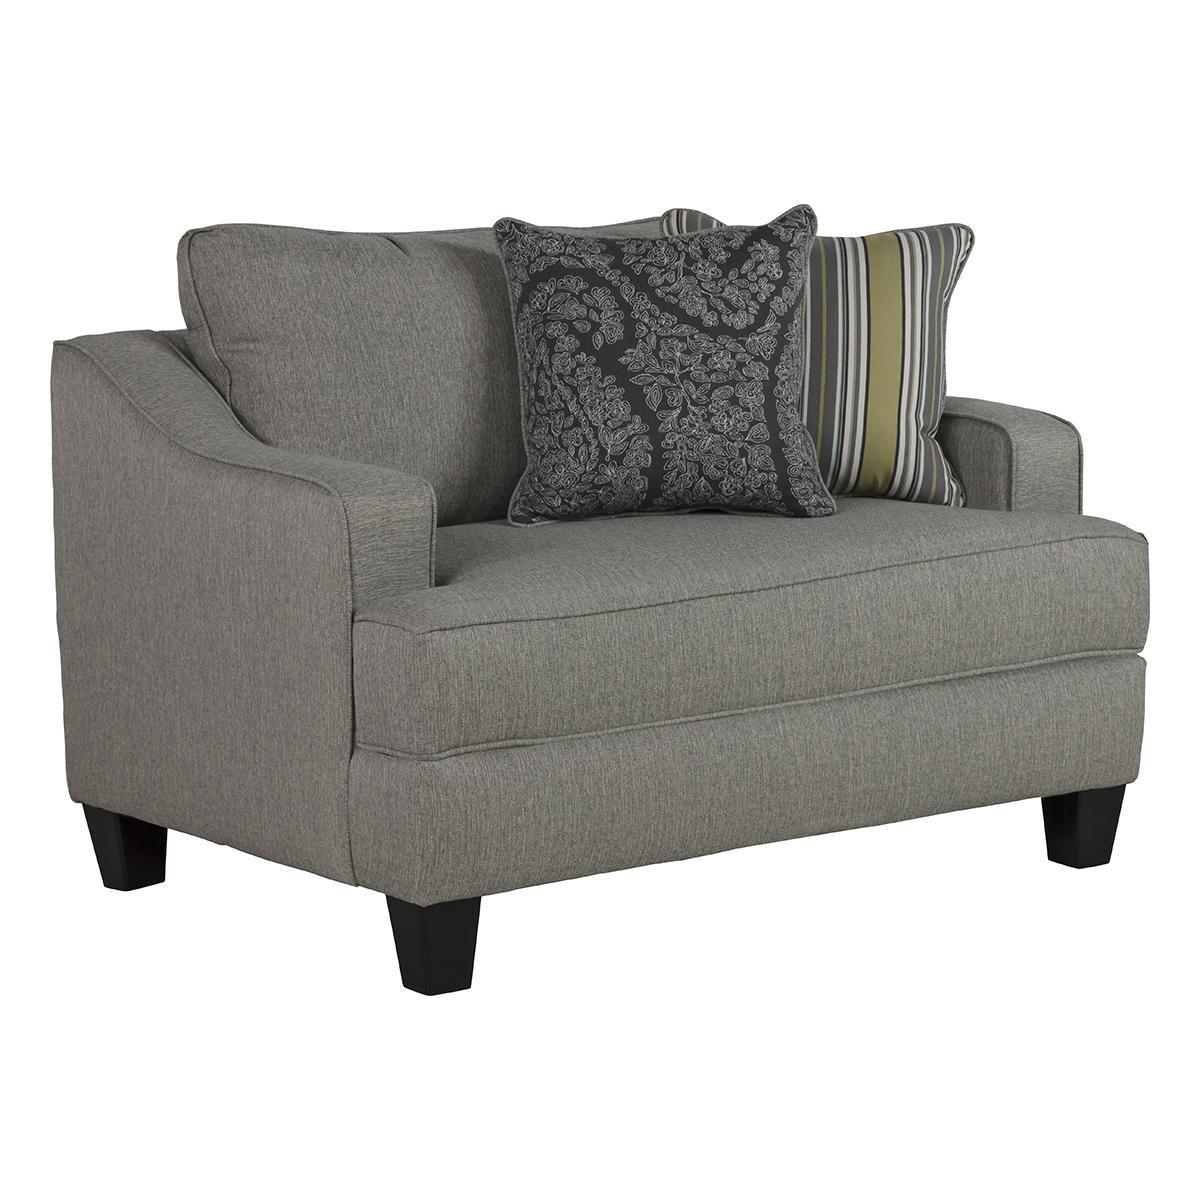 Product Main Image 0 Chair And A Half Nebraska Furniture Mart